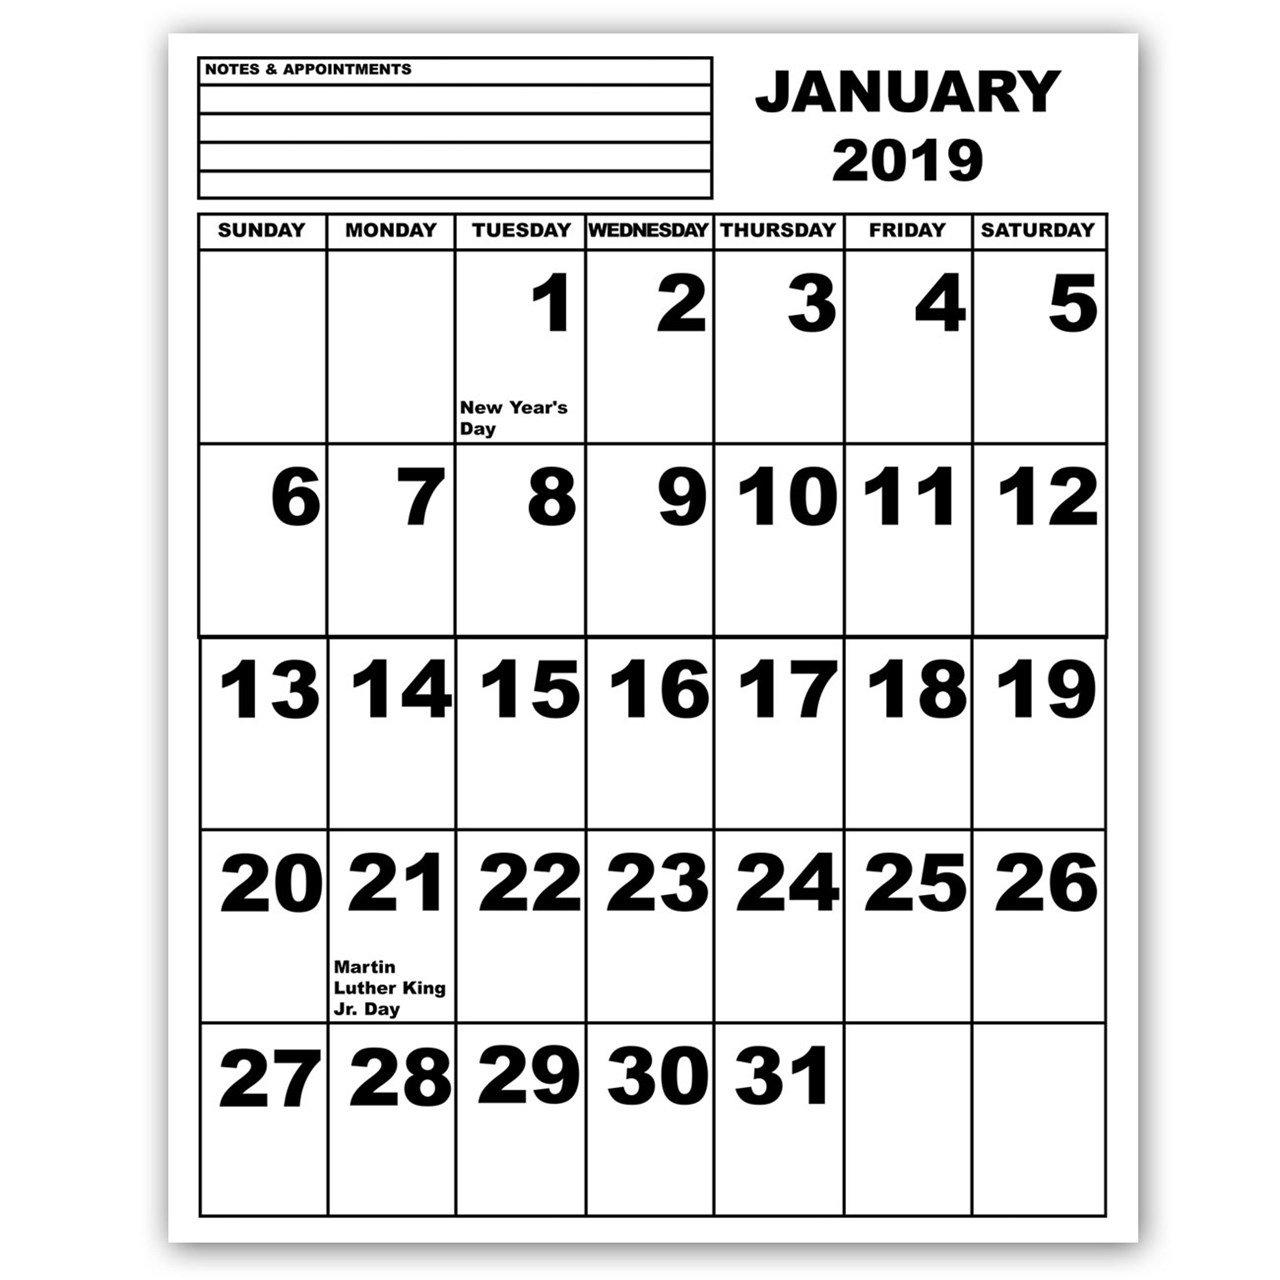 Maxiaids | Jumbo Print Calendar - 2019 Calendar 2019 With Pictures